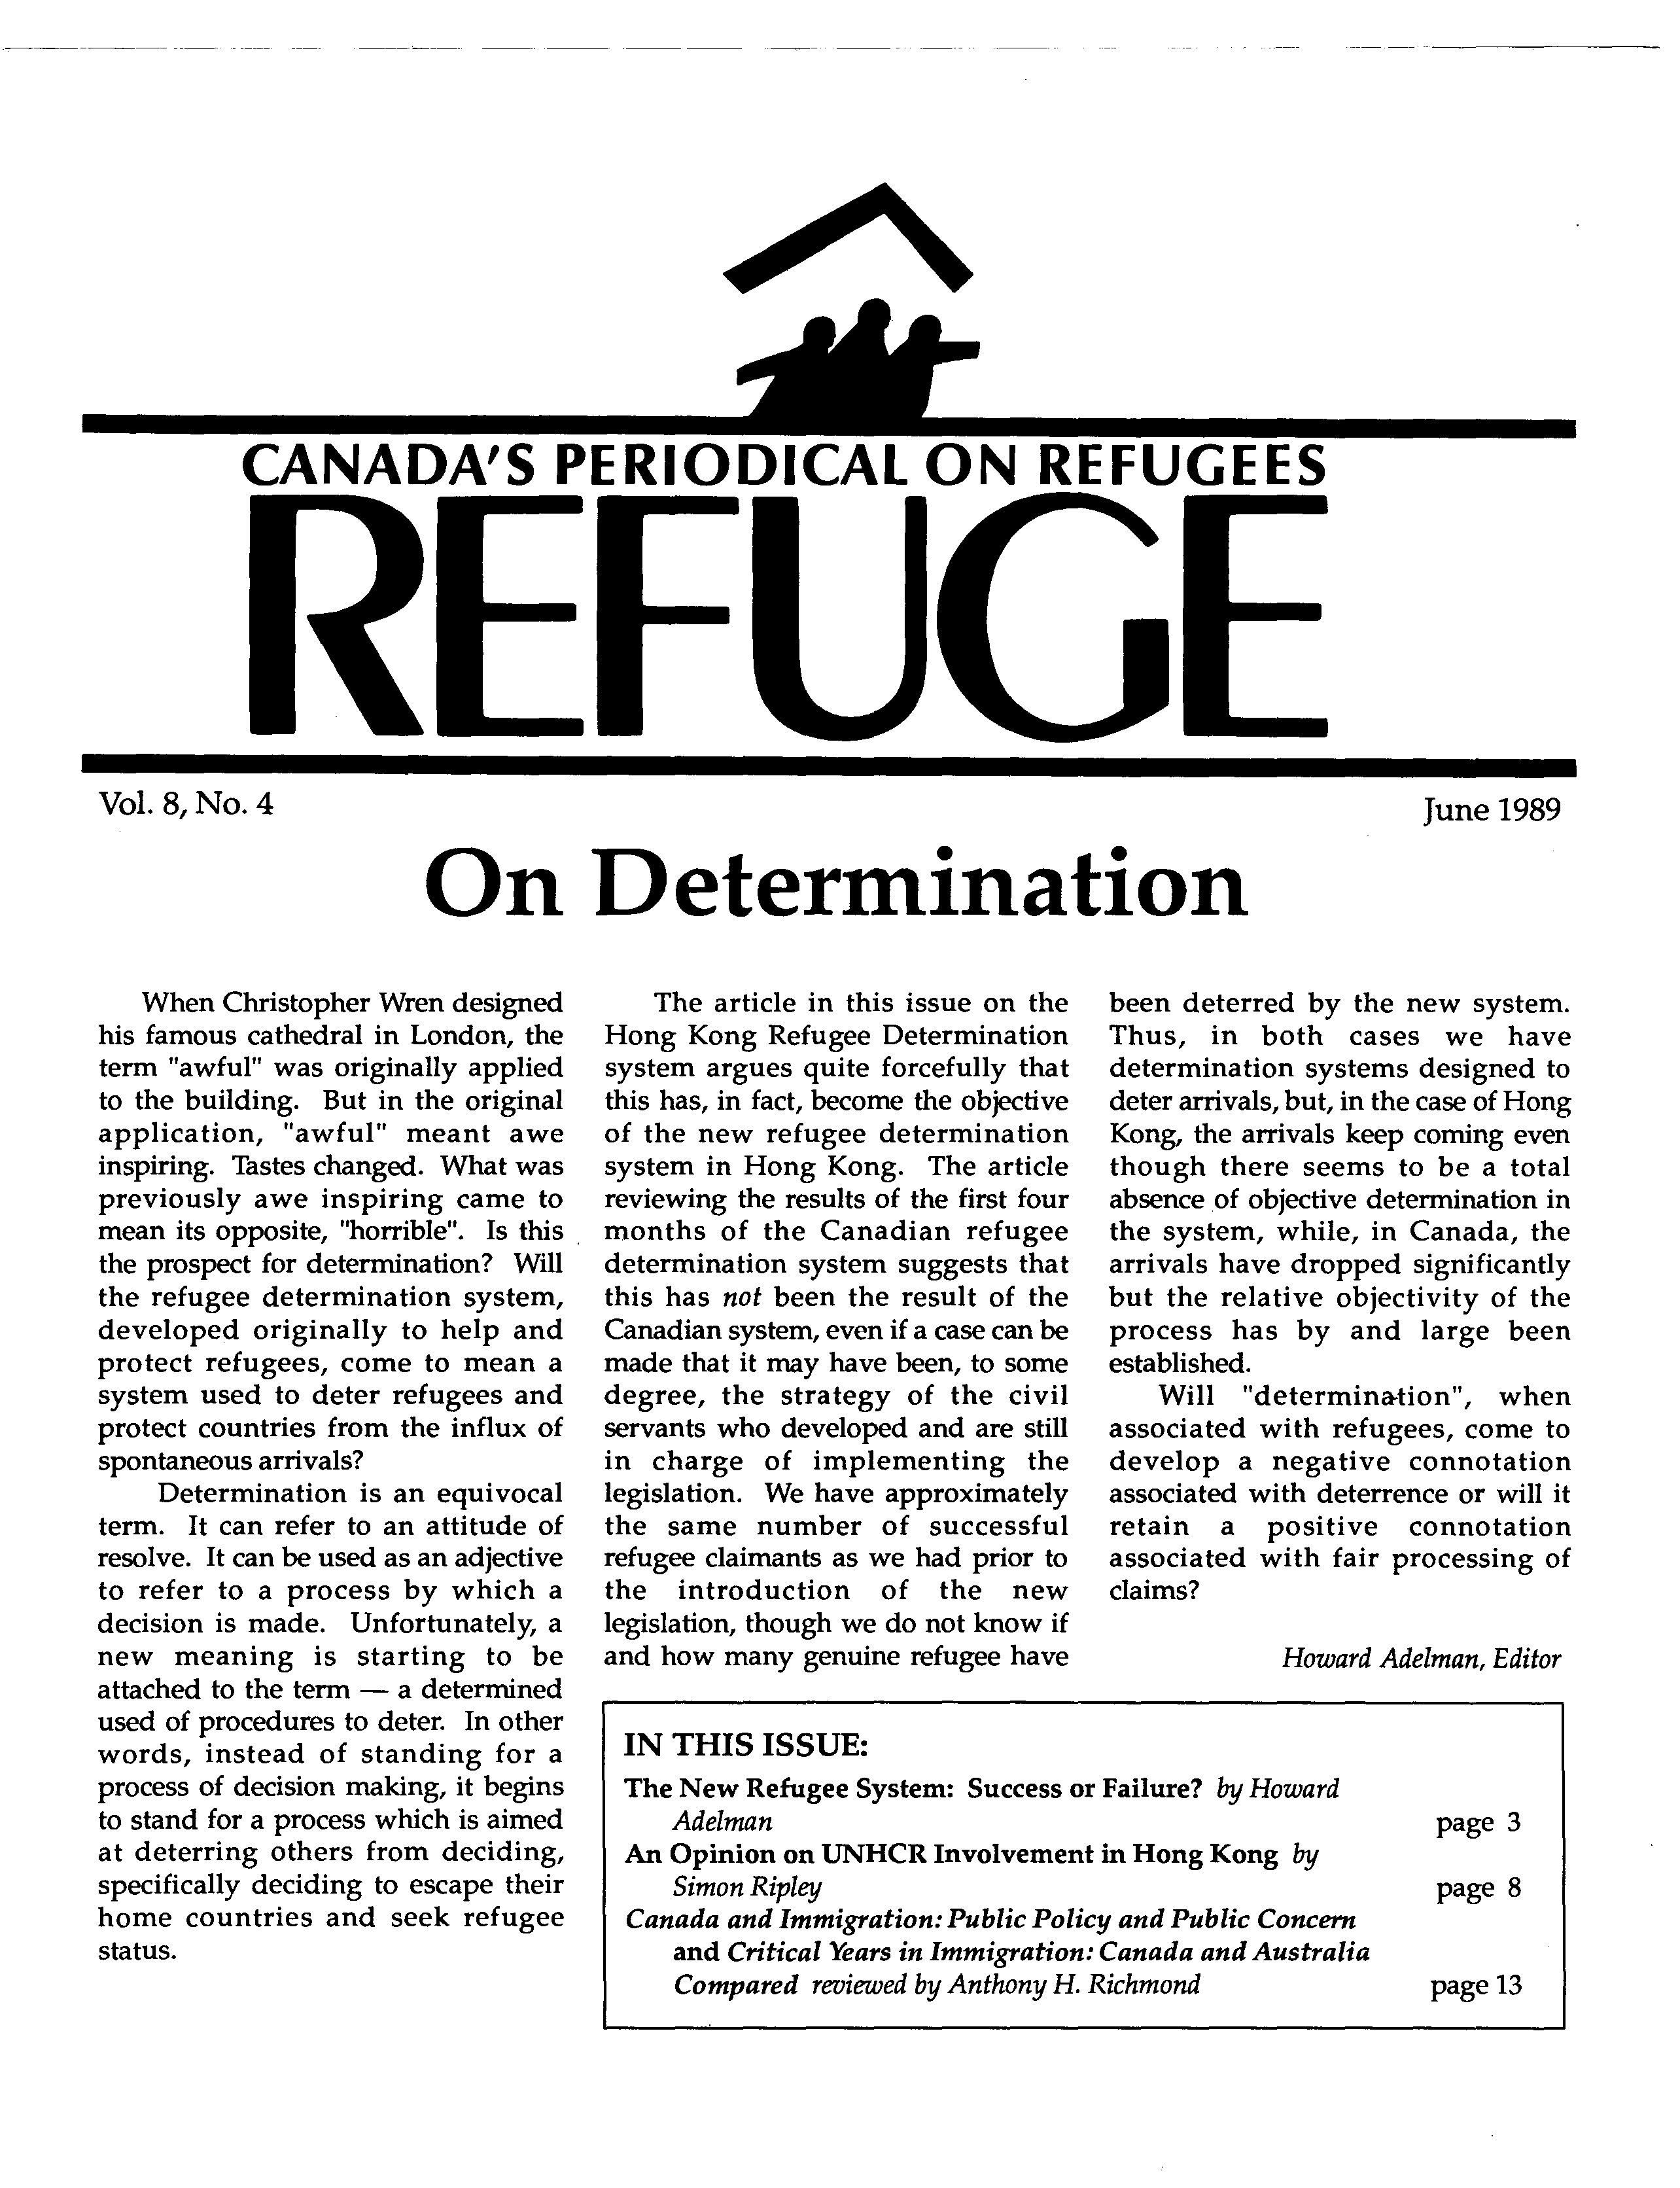 first page Refuge vol. 8.4 1989